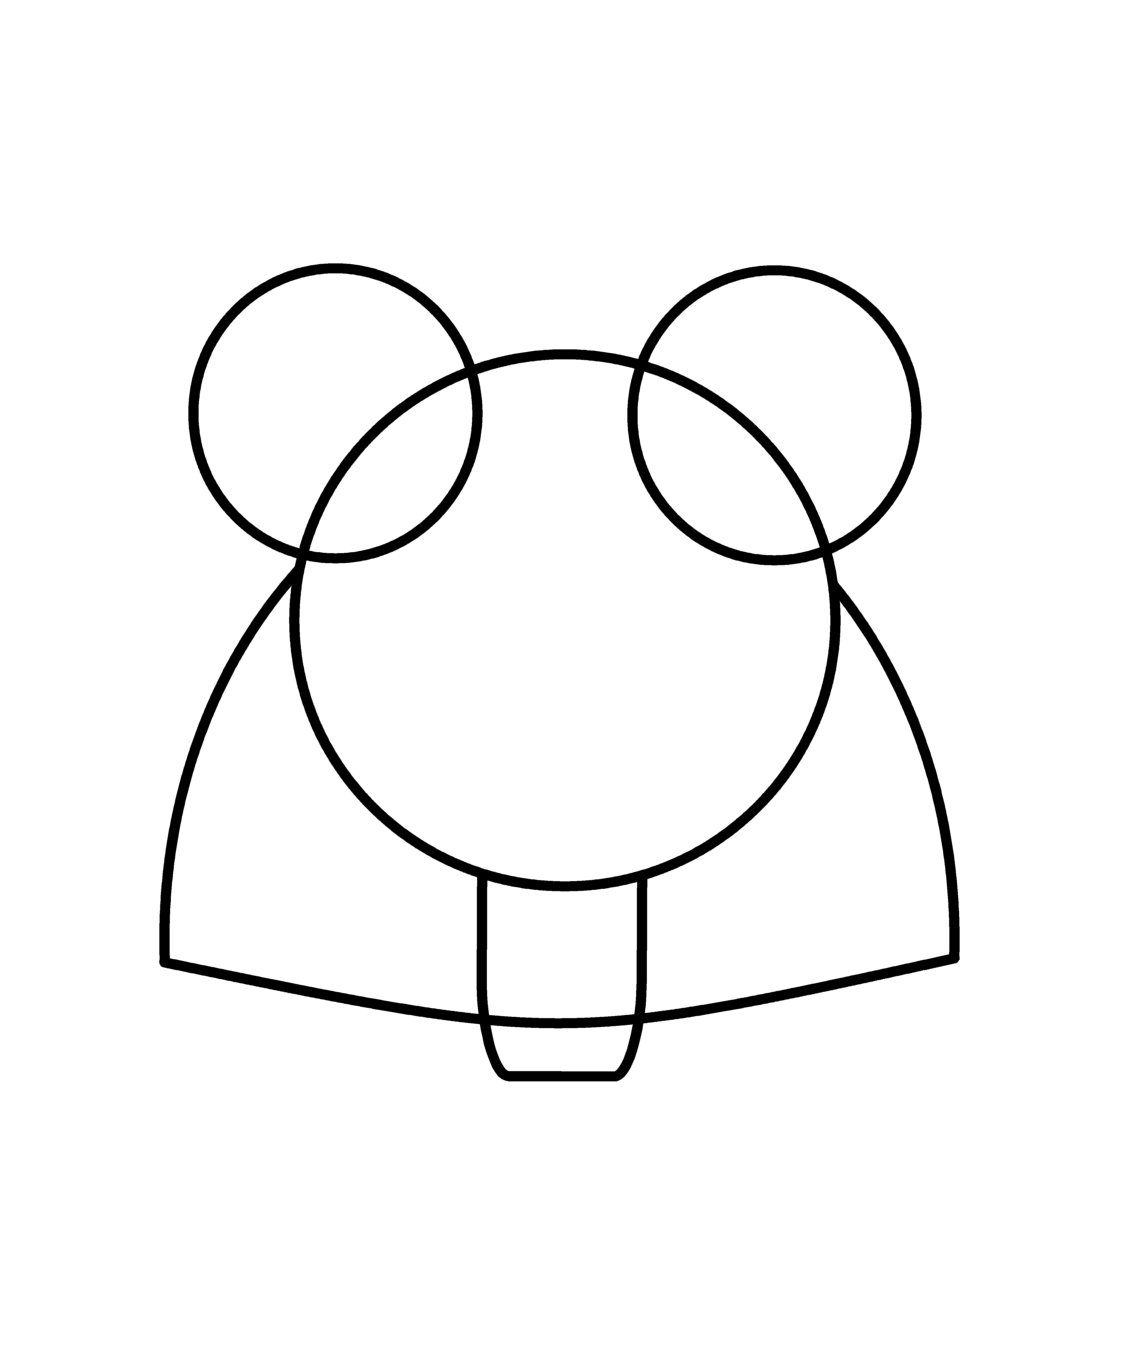 How To Draw Cartoons Anime Turtle